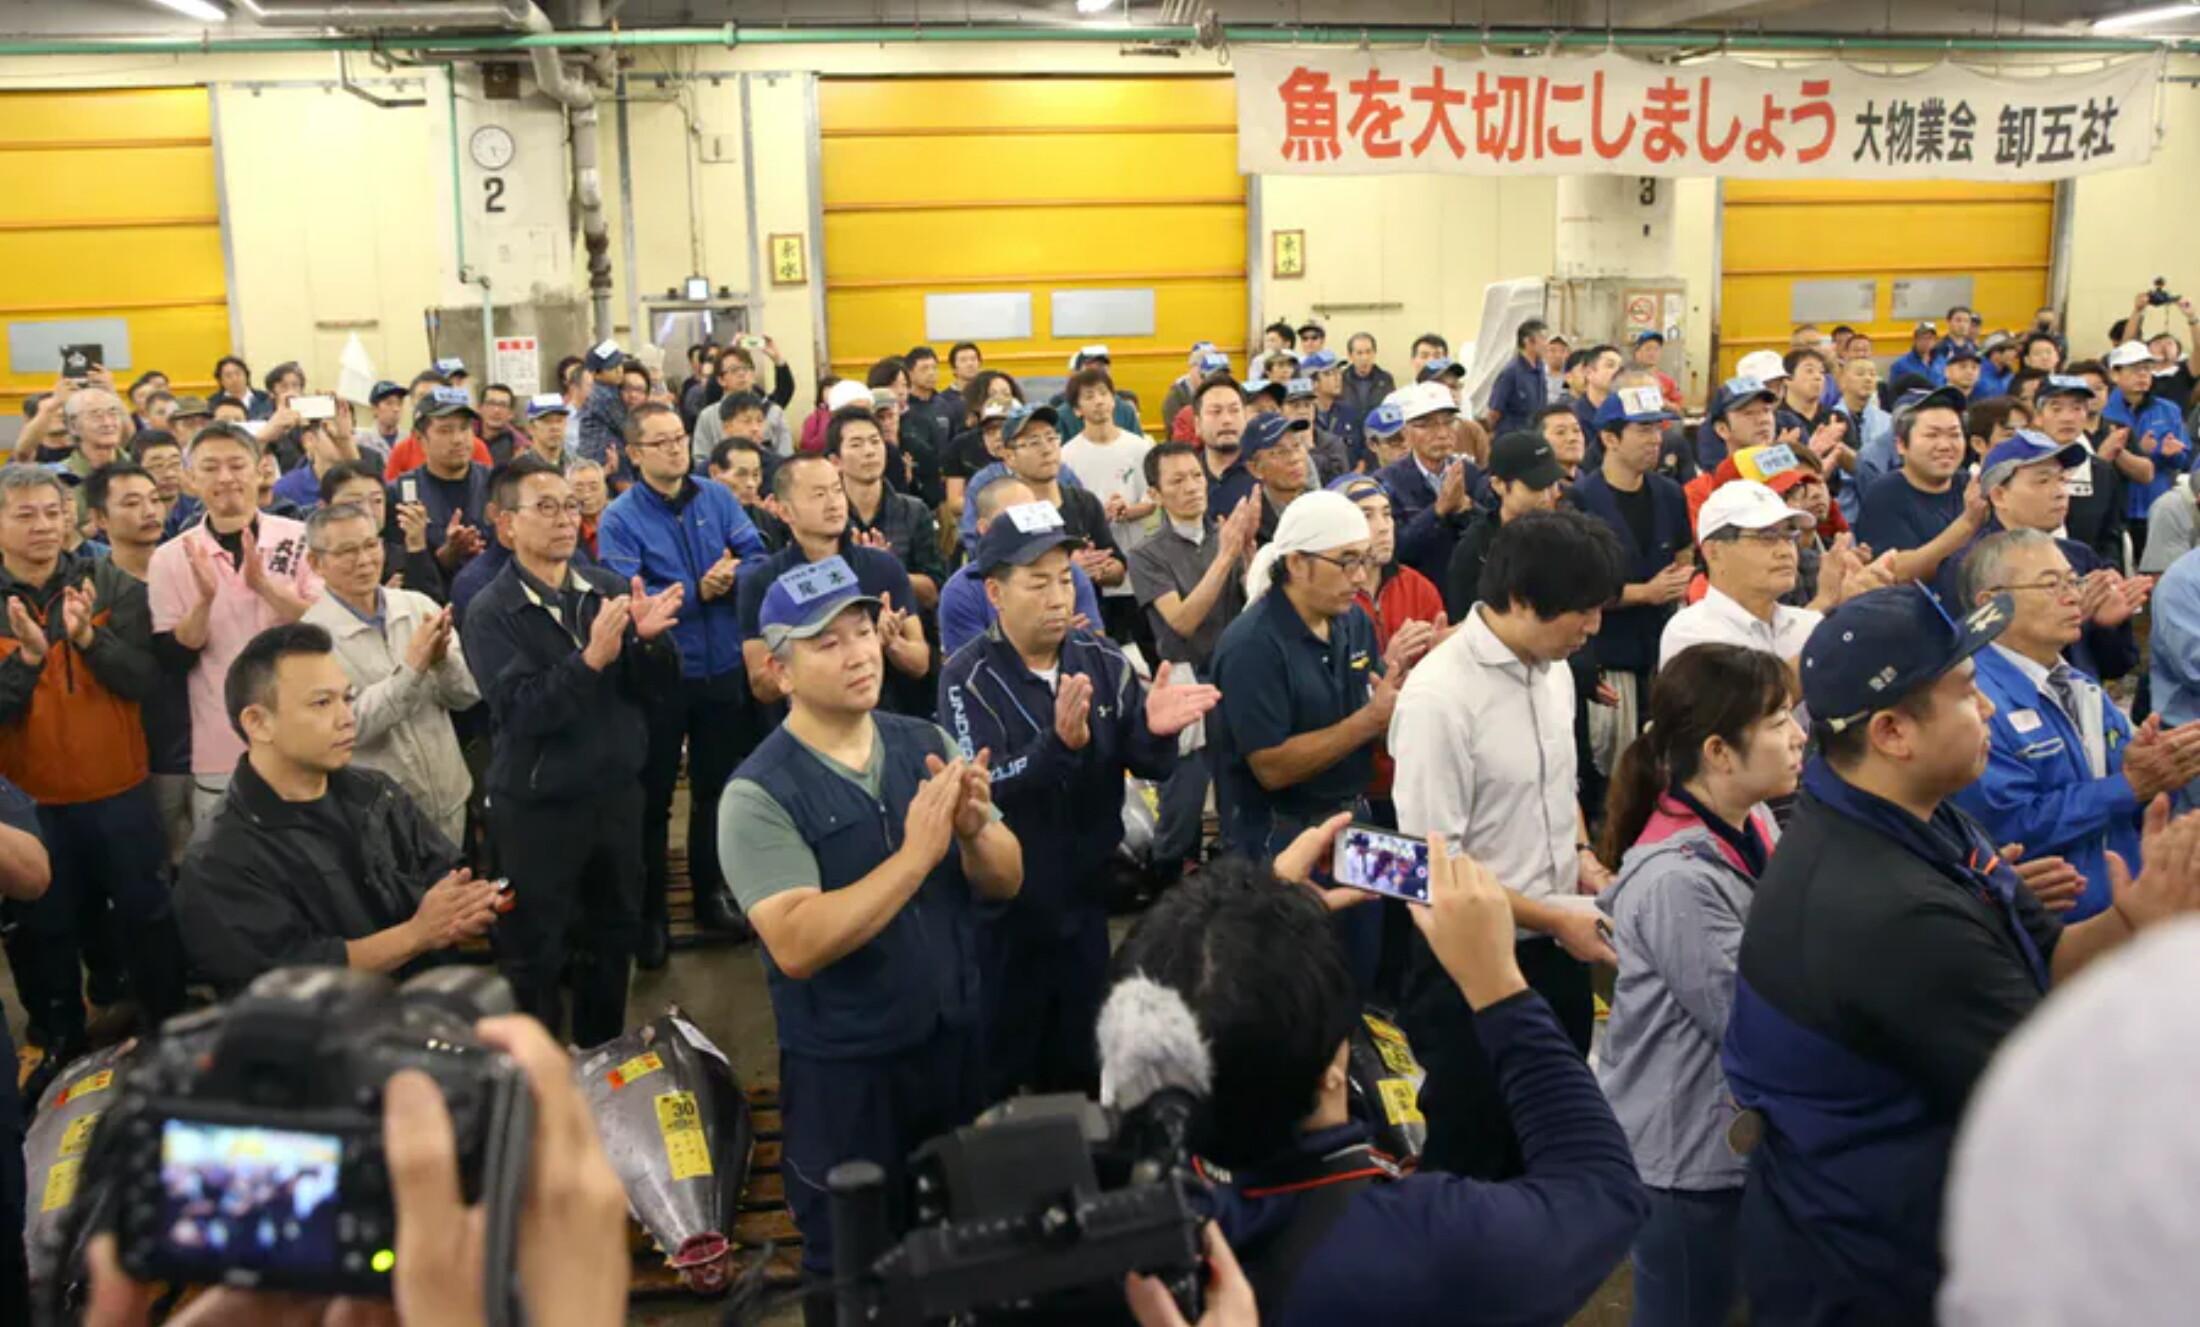 Last_day_of_Tsukiji_Market